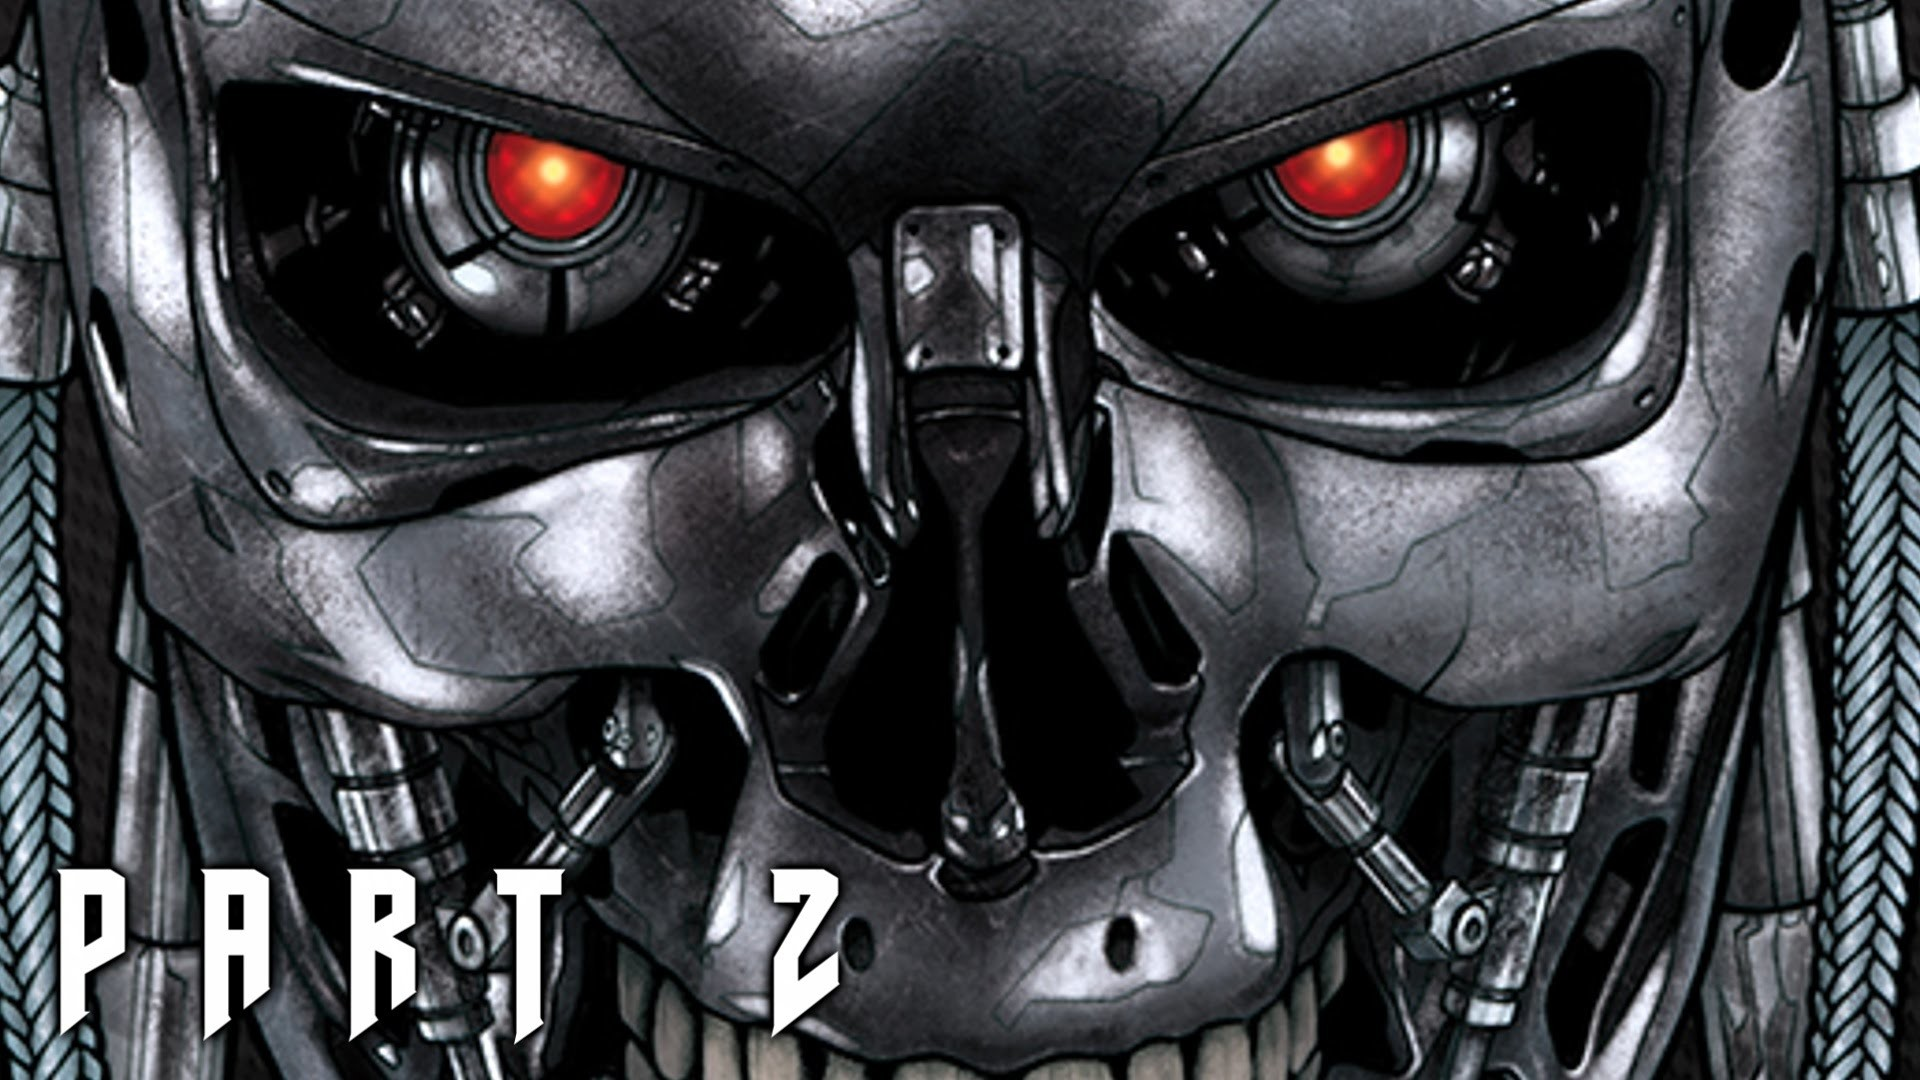 Res: 1920x1080, Terminator 2: Judgment Day Wallpaper 22 - 1920 X 1080